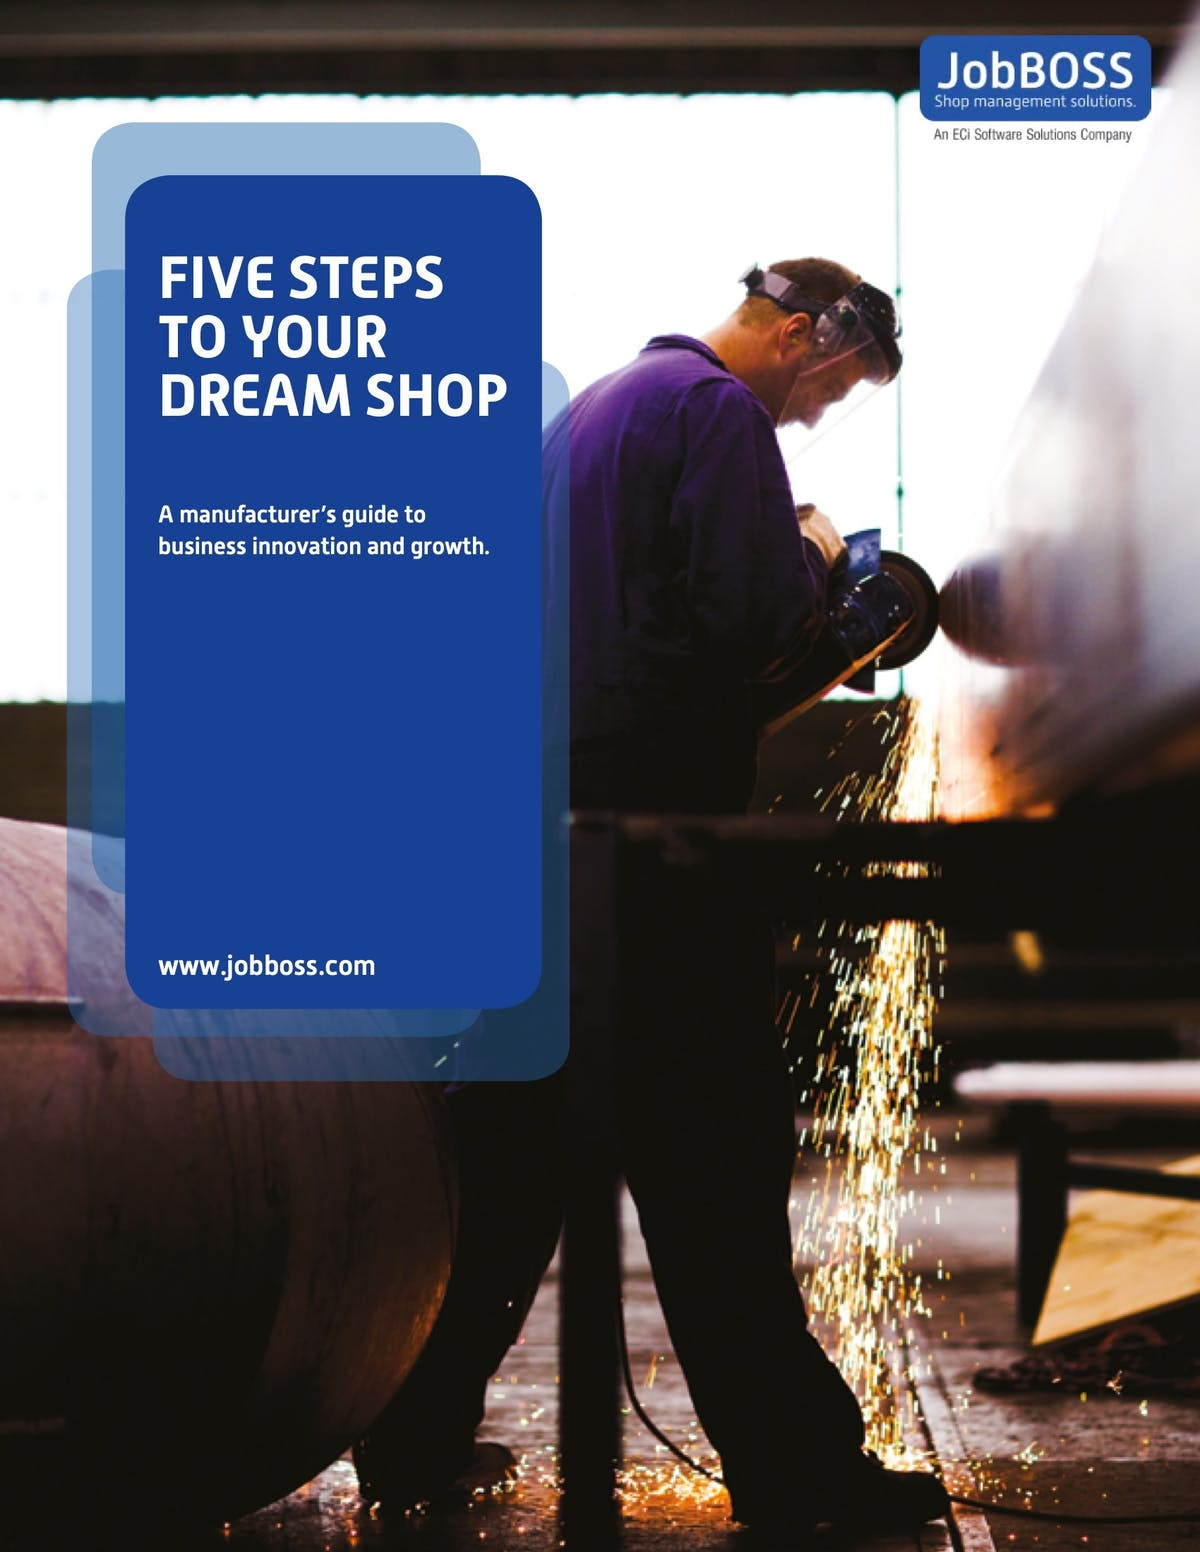 JobBOSS  Shop Management Solution White Paper - 5 Steps to Your Dream Shop